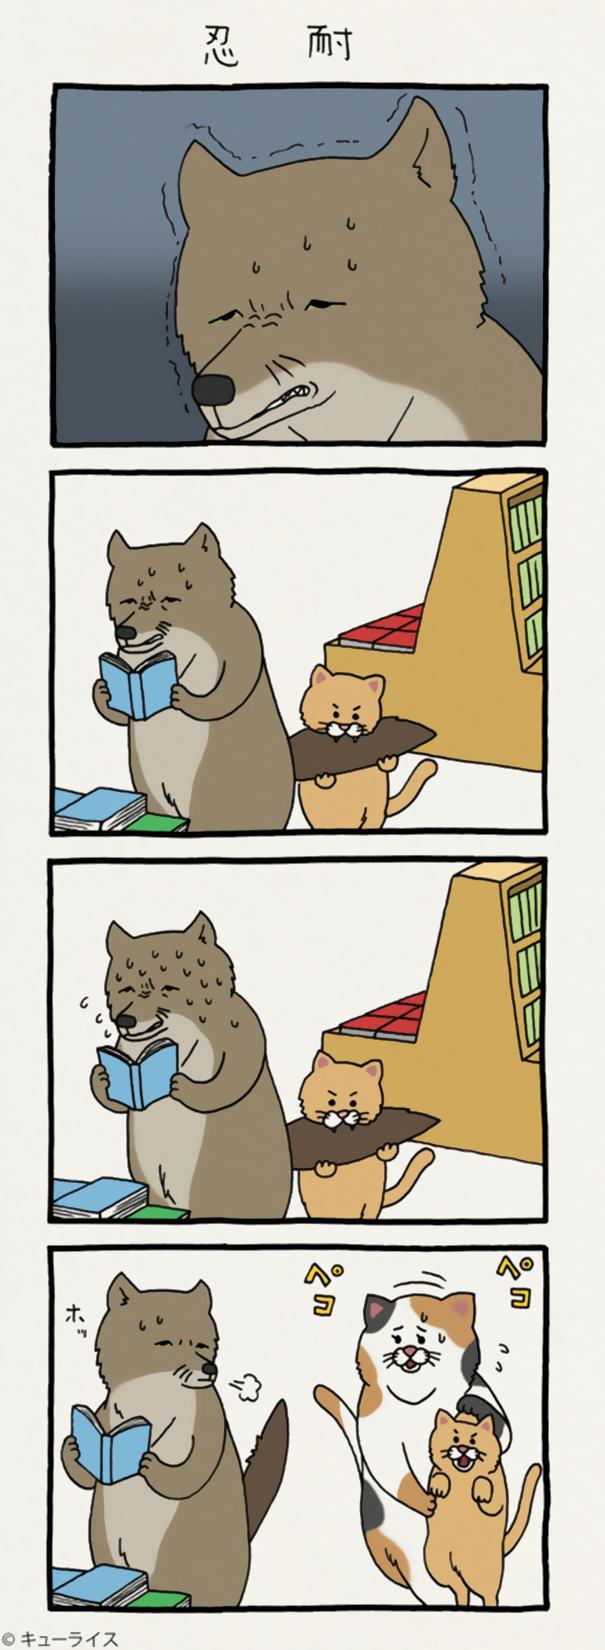 dog cartoon comics qrais japan 15 5989606d19cd1  605 - 우울한 당신을 웃게 해줄 '착한 티벳 여우' 4컷 만화